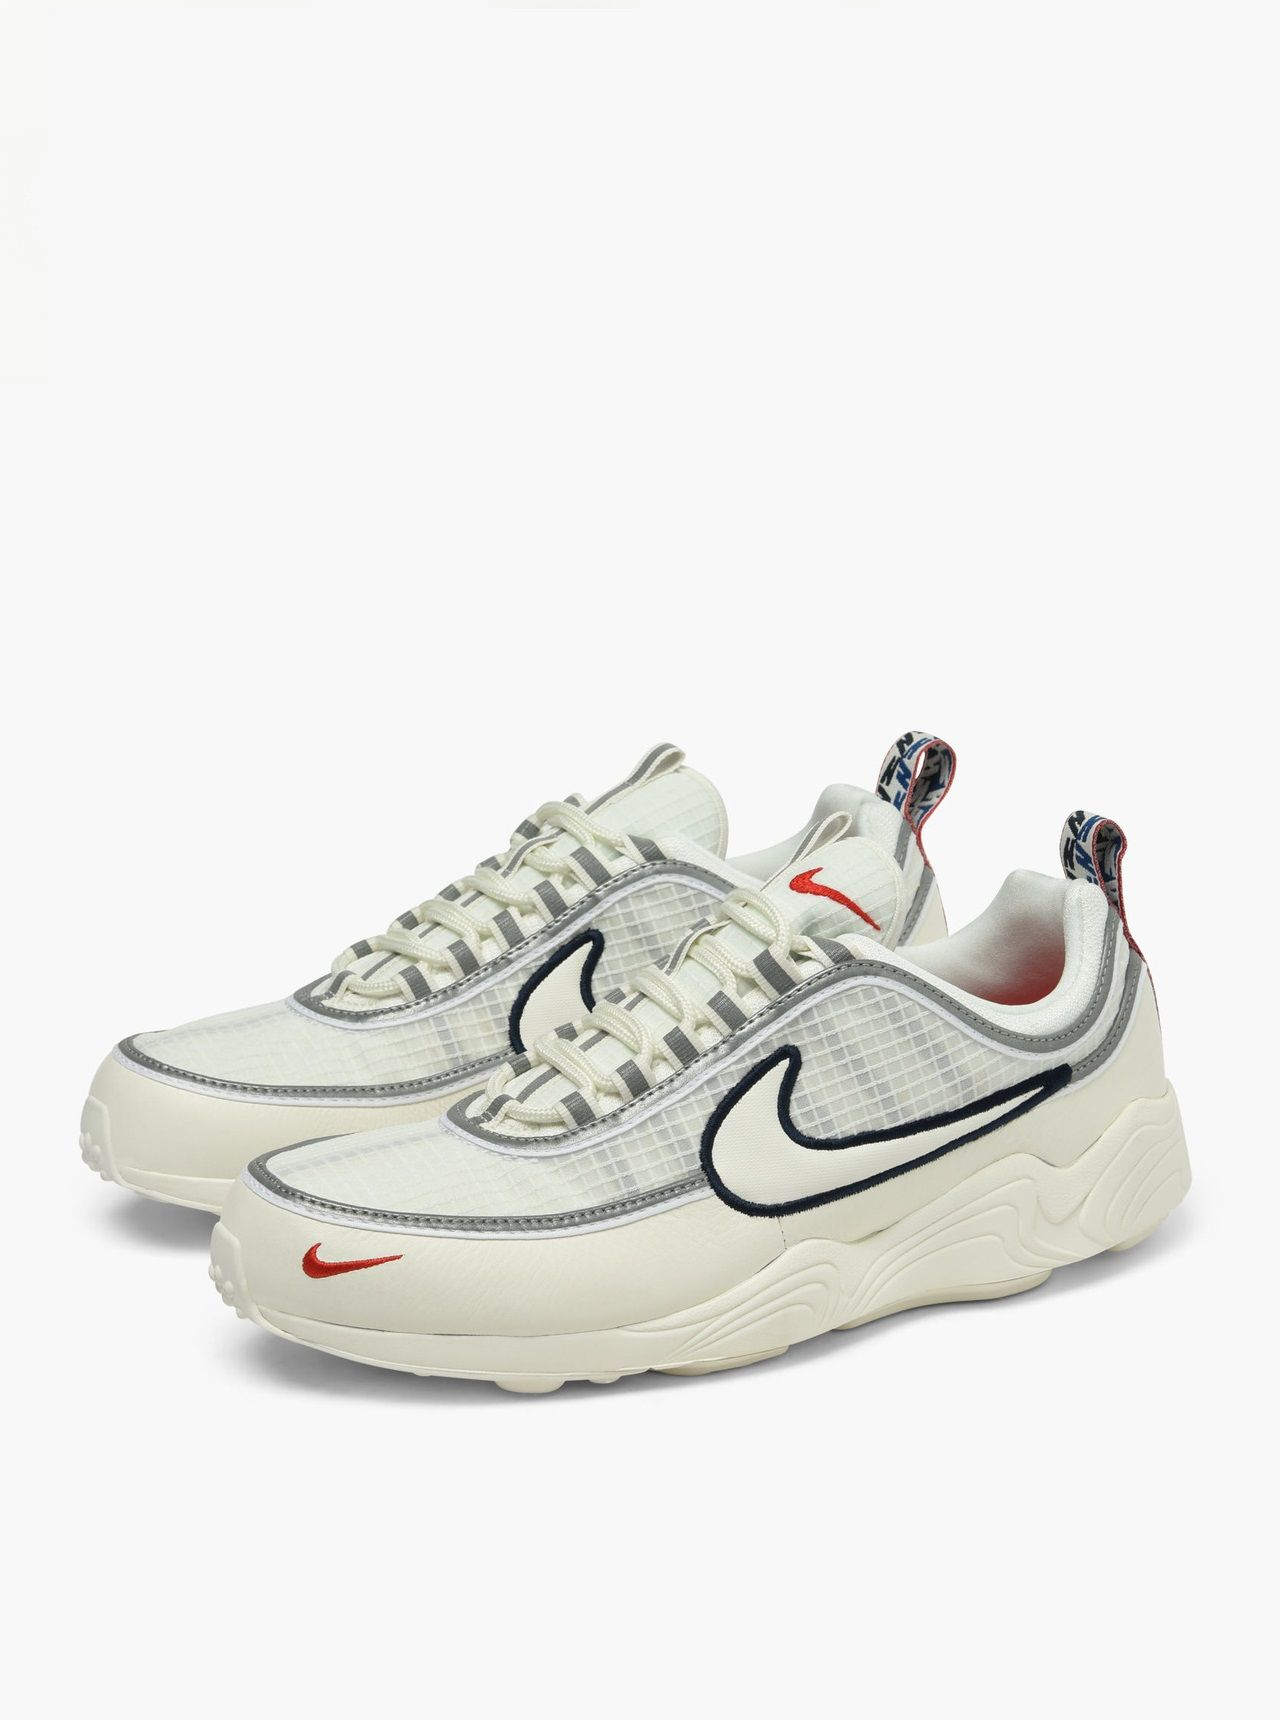 b86cd9d311d Nike Air Zoom Spiridon SE 'USA Tape' | Sneakers: Nike Air Spiridon ...